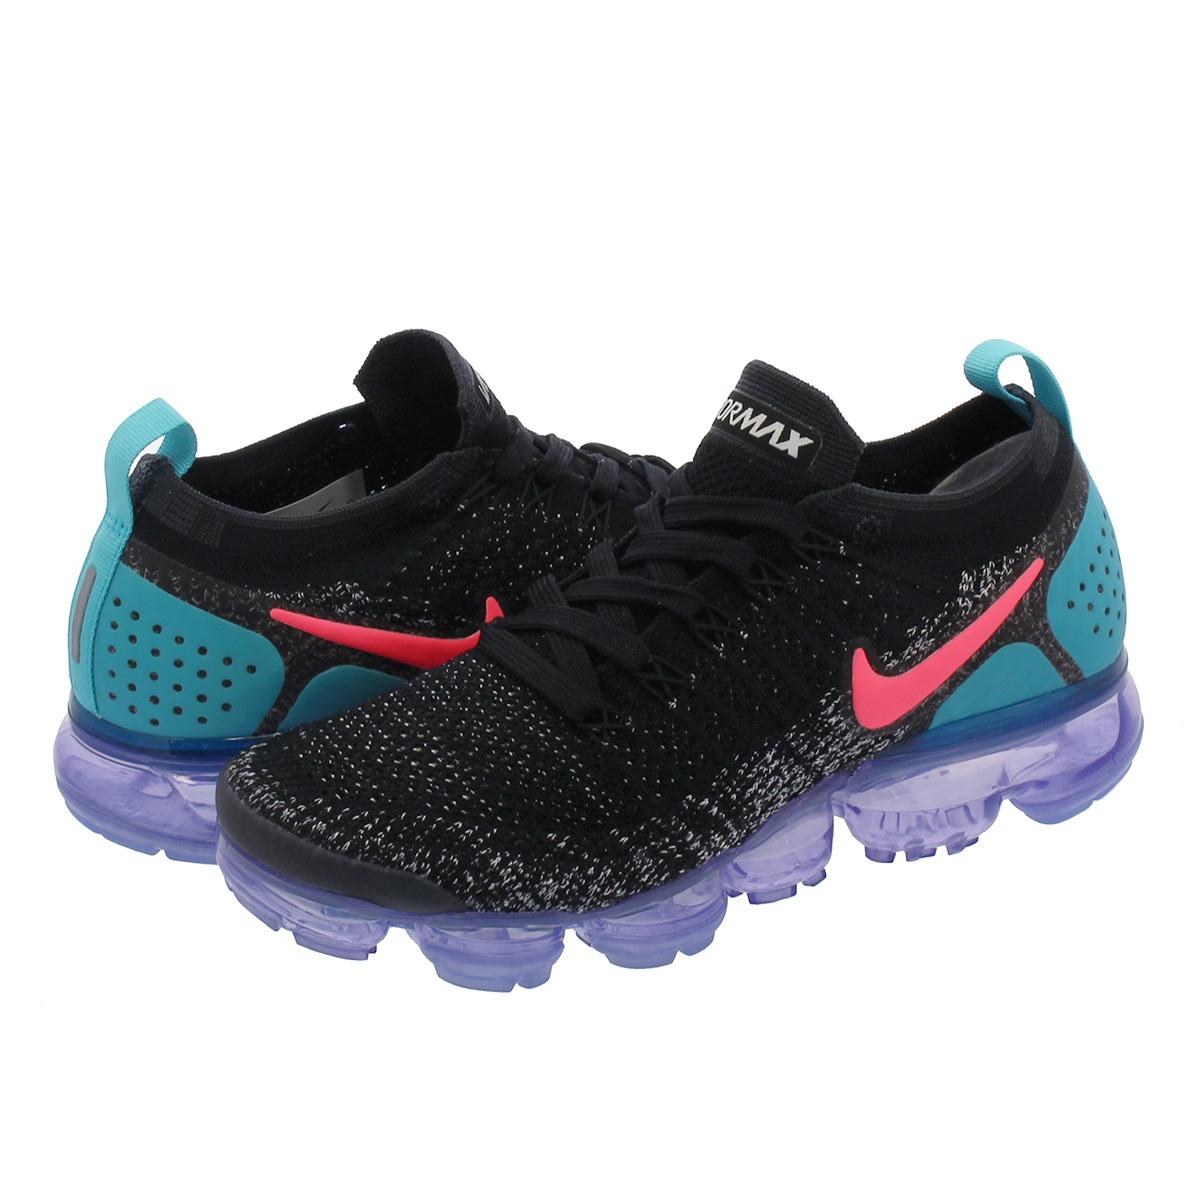 on sale d5061 7671b NIKE WMNS AIR VAPORMAX FLYKNIT 2 Nike women vapor max fried food knit  BLACK/HOT PUNCH/CACTUS 942,843-003